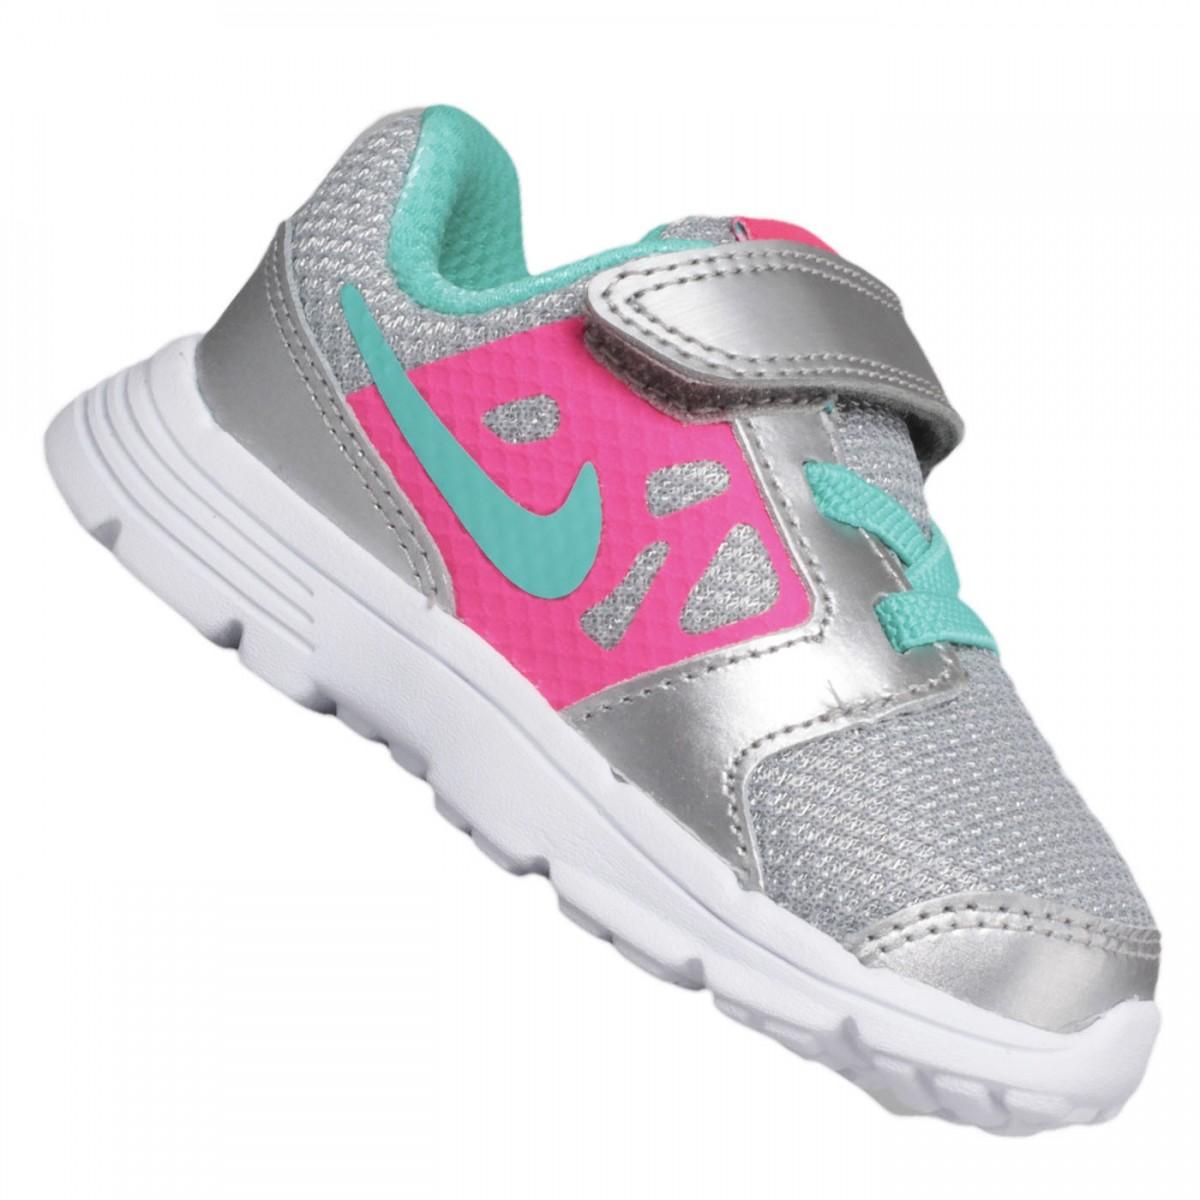 777ebc9781f Tênis Nike Downshifter 6 (TD) - Feminino